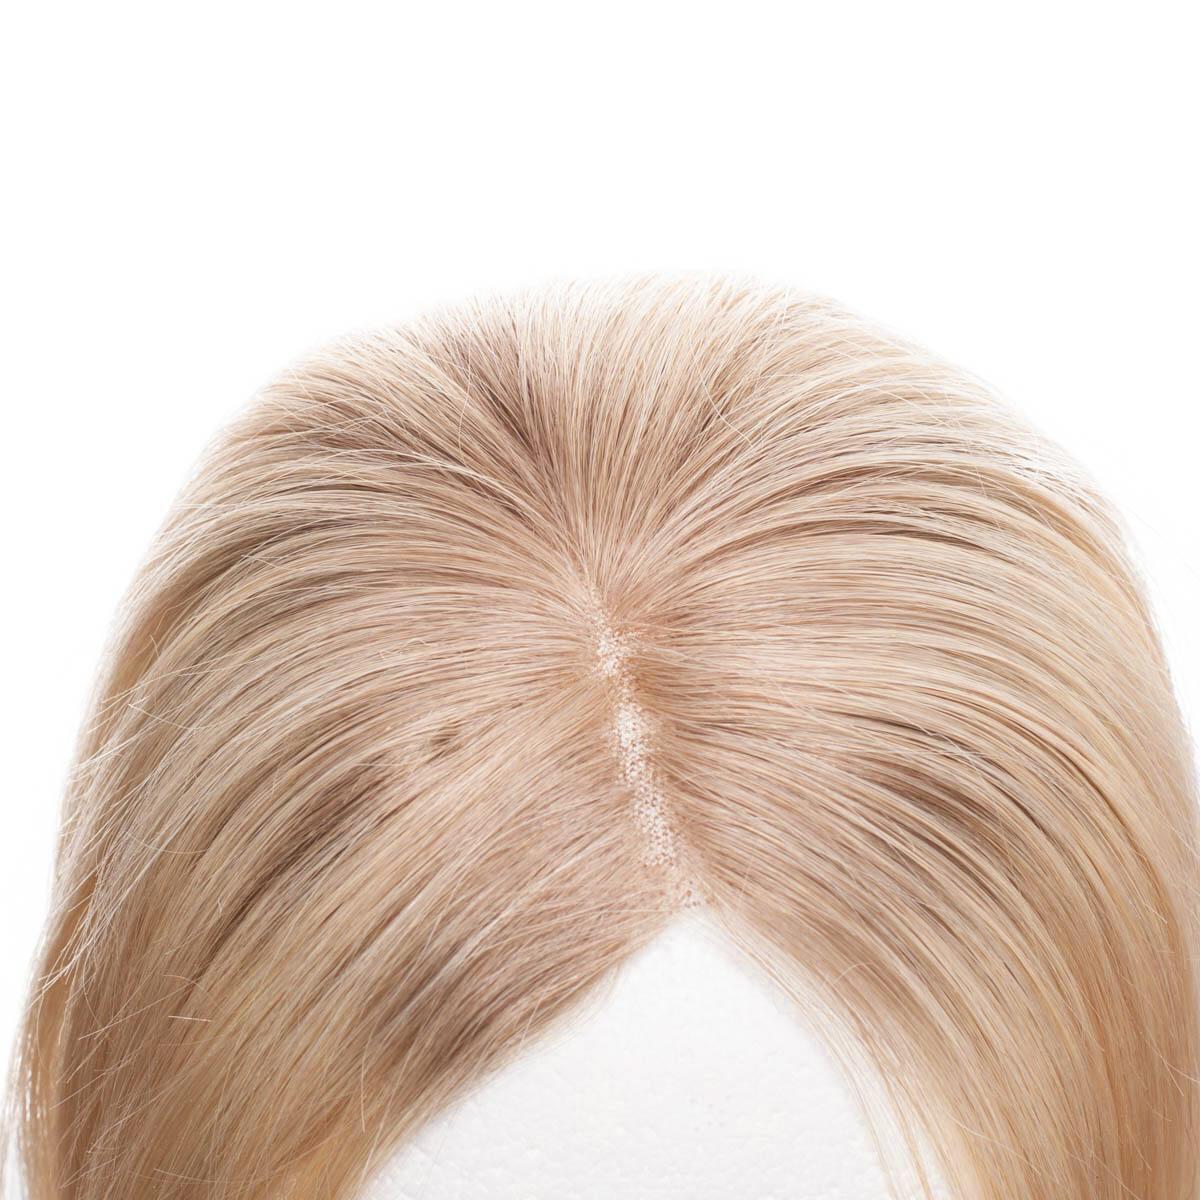 Top Piece Original Glatt R7.3/8.0 Cendre Golden Blonde Root 30 cm